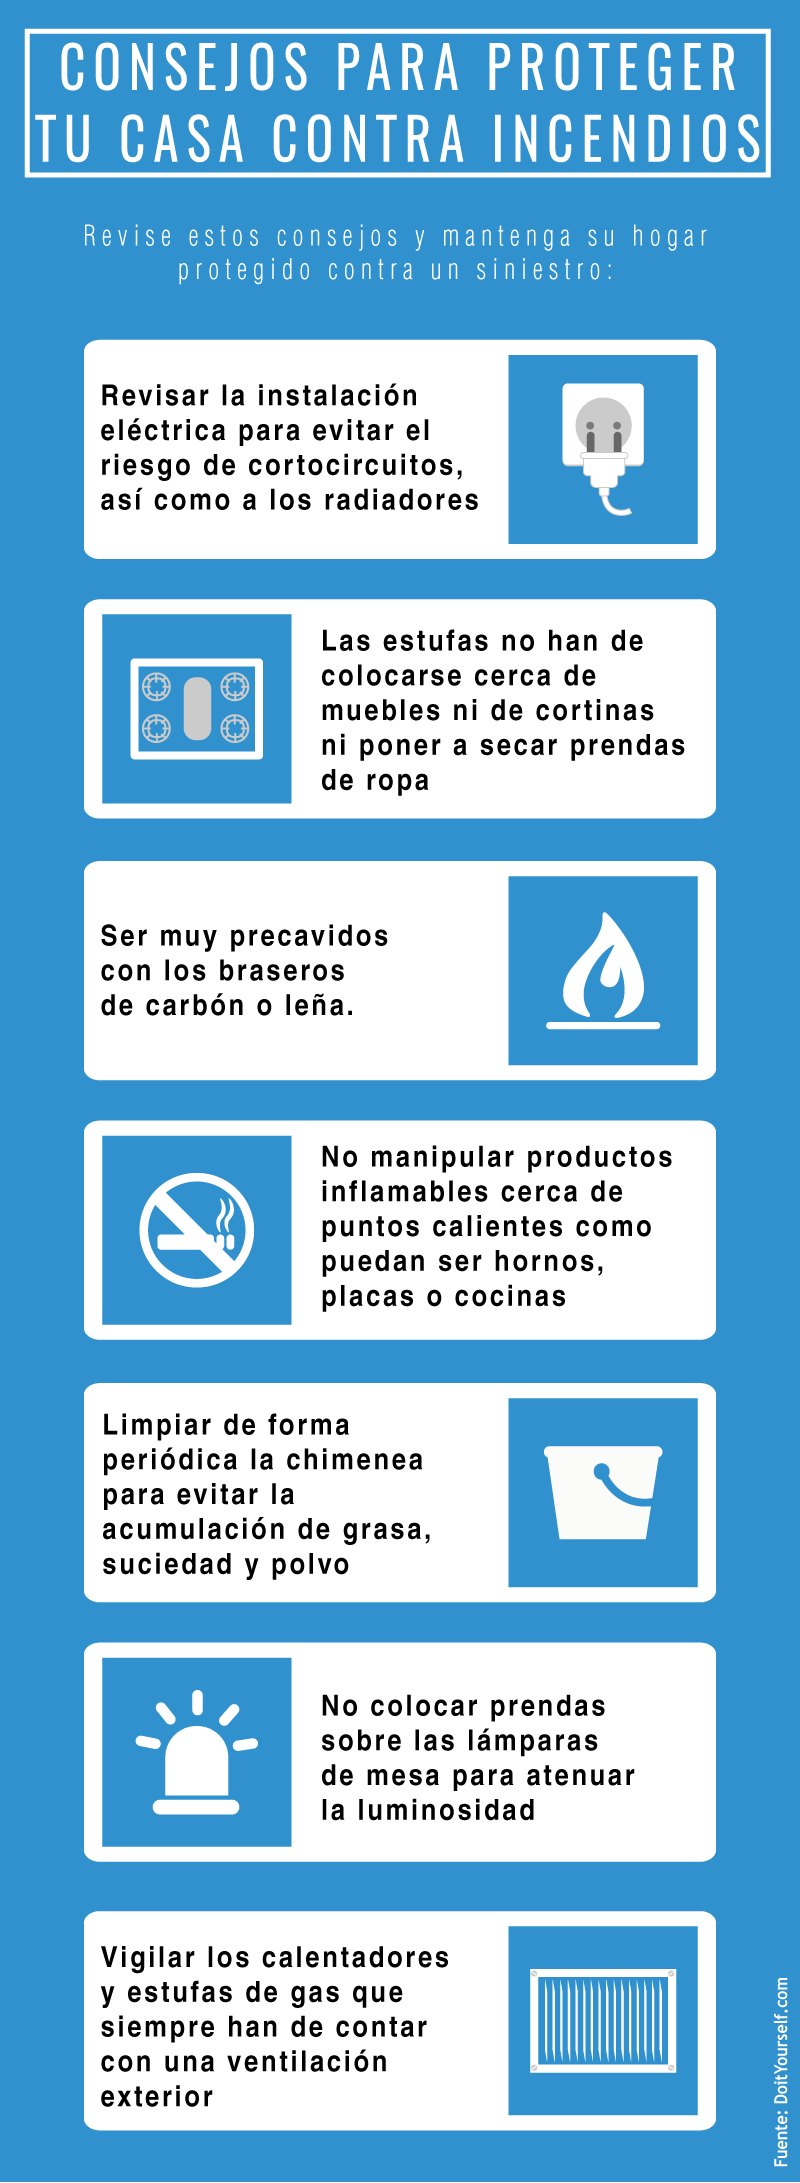 tips contra incendio-segured